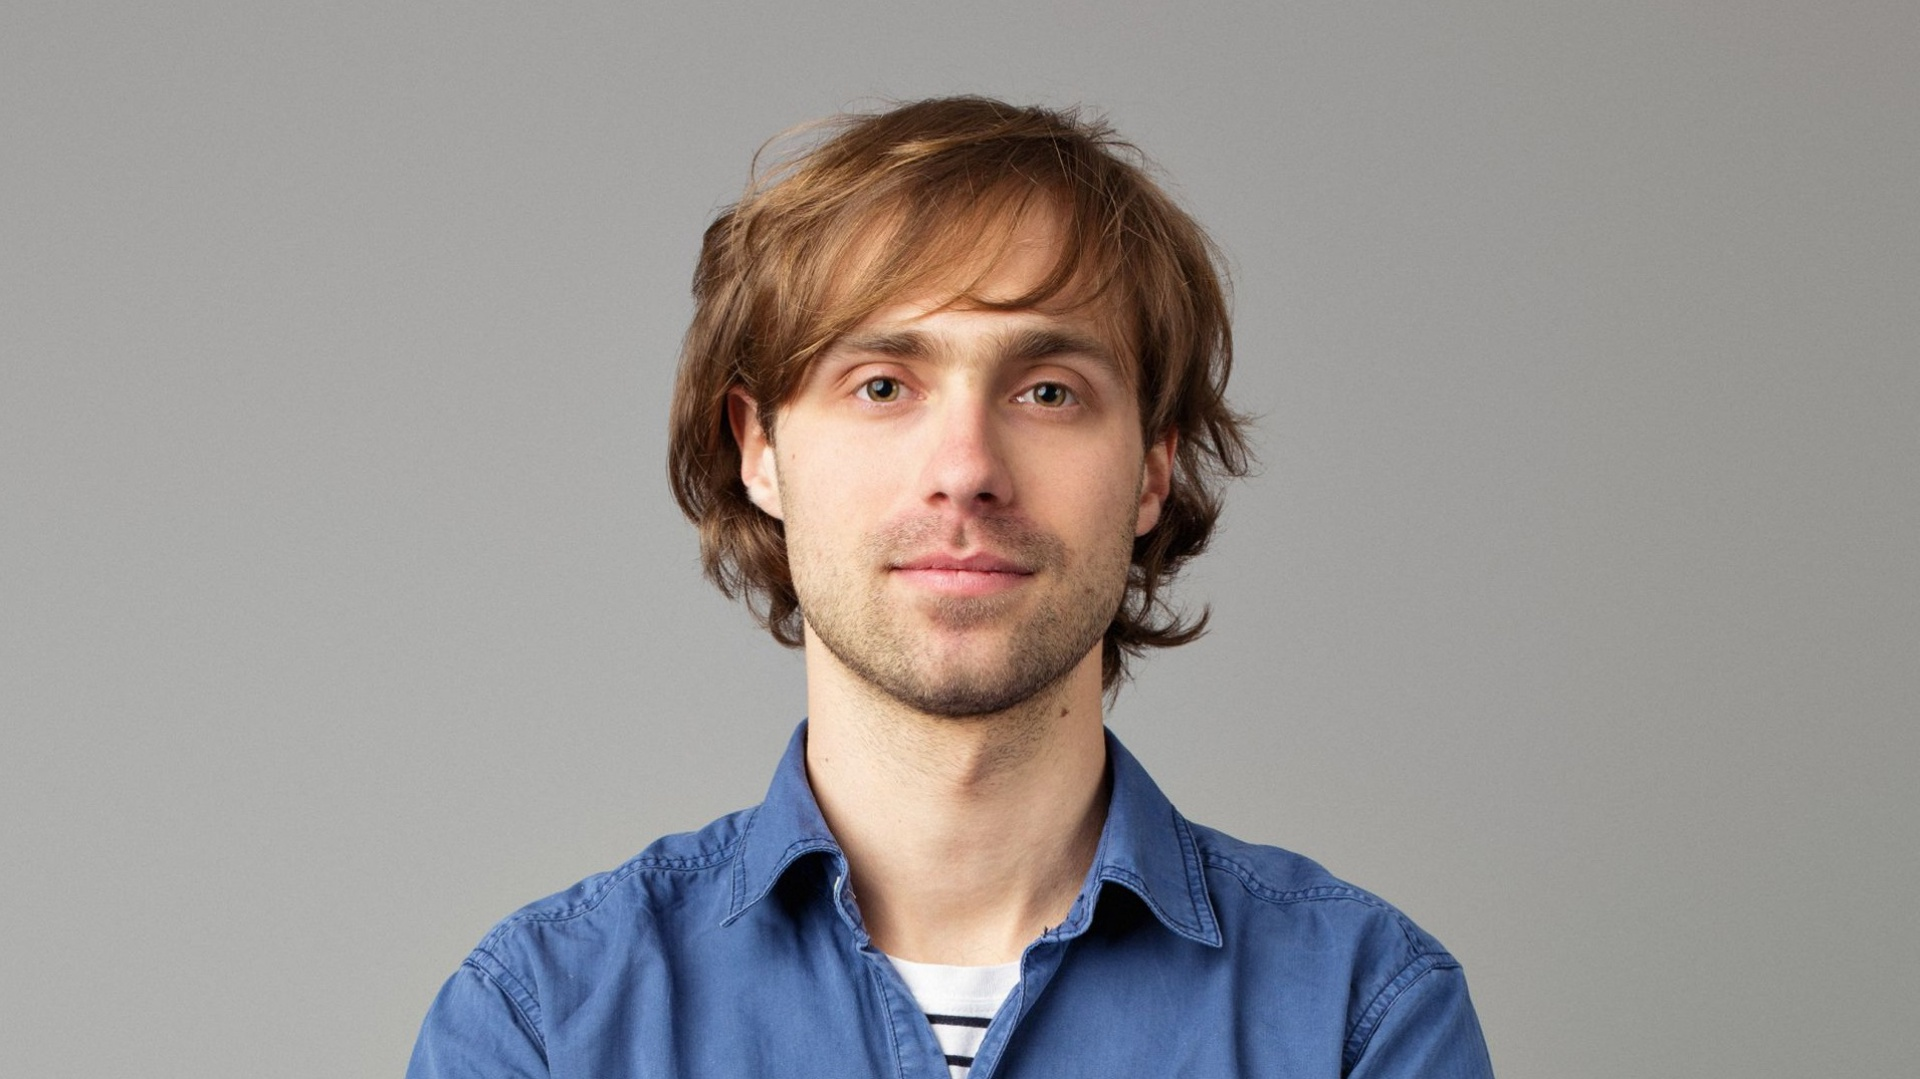 Jan Kochański